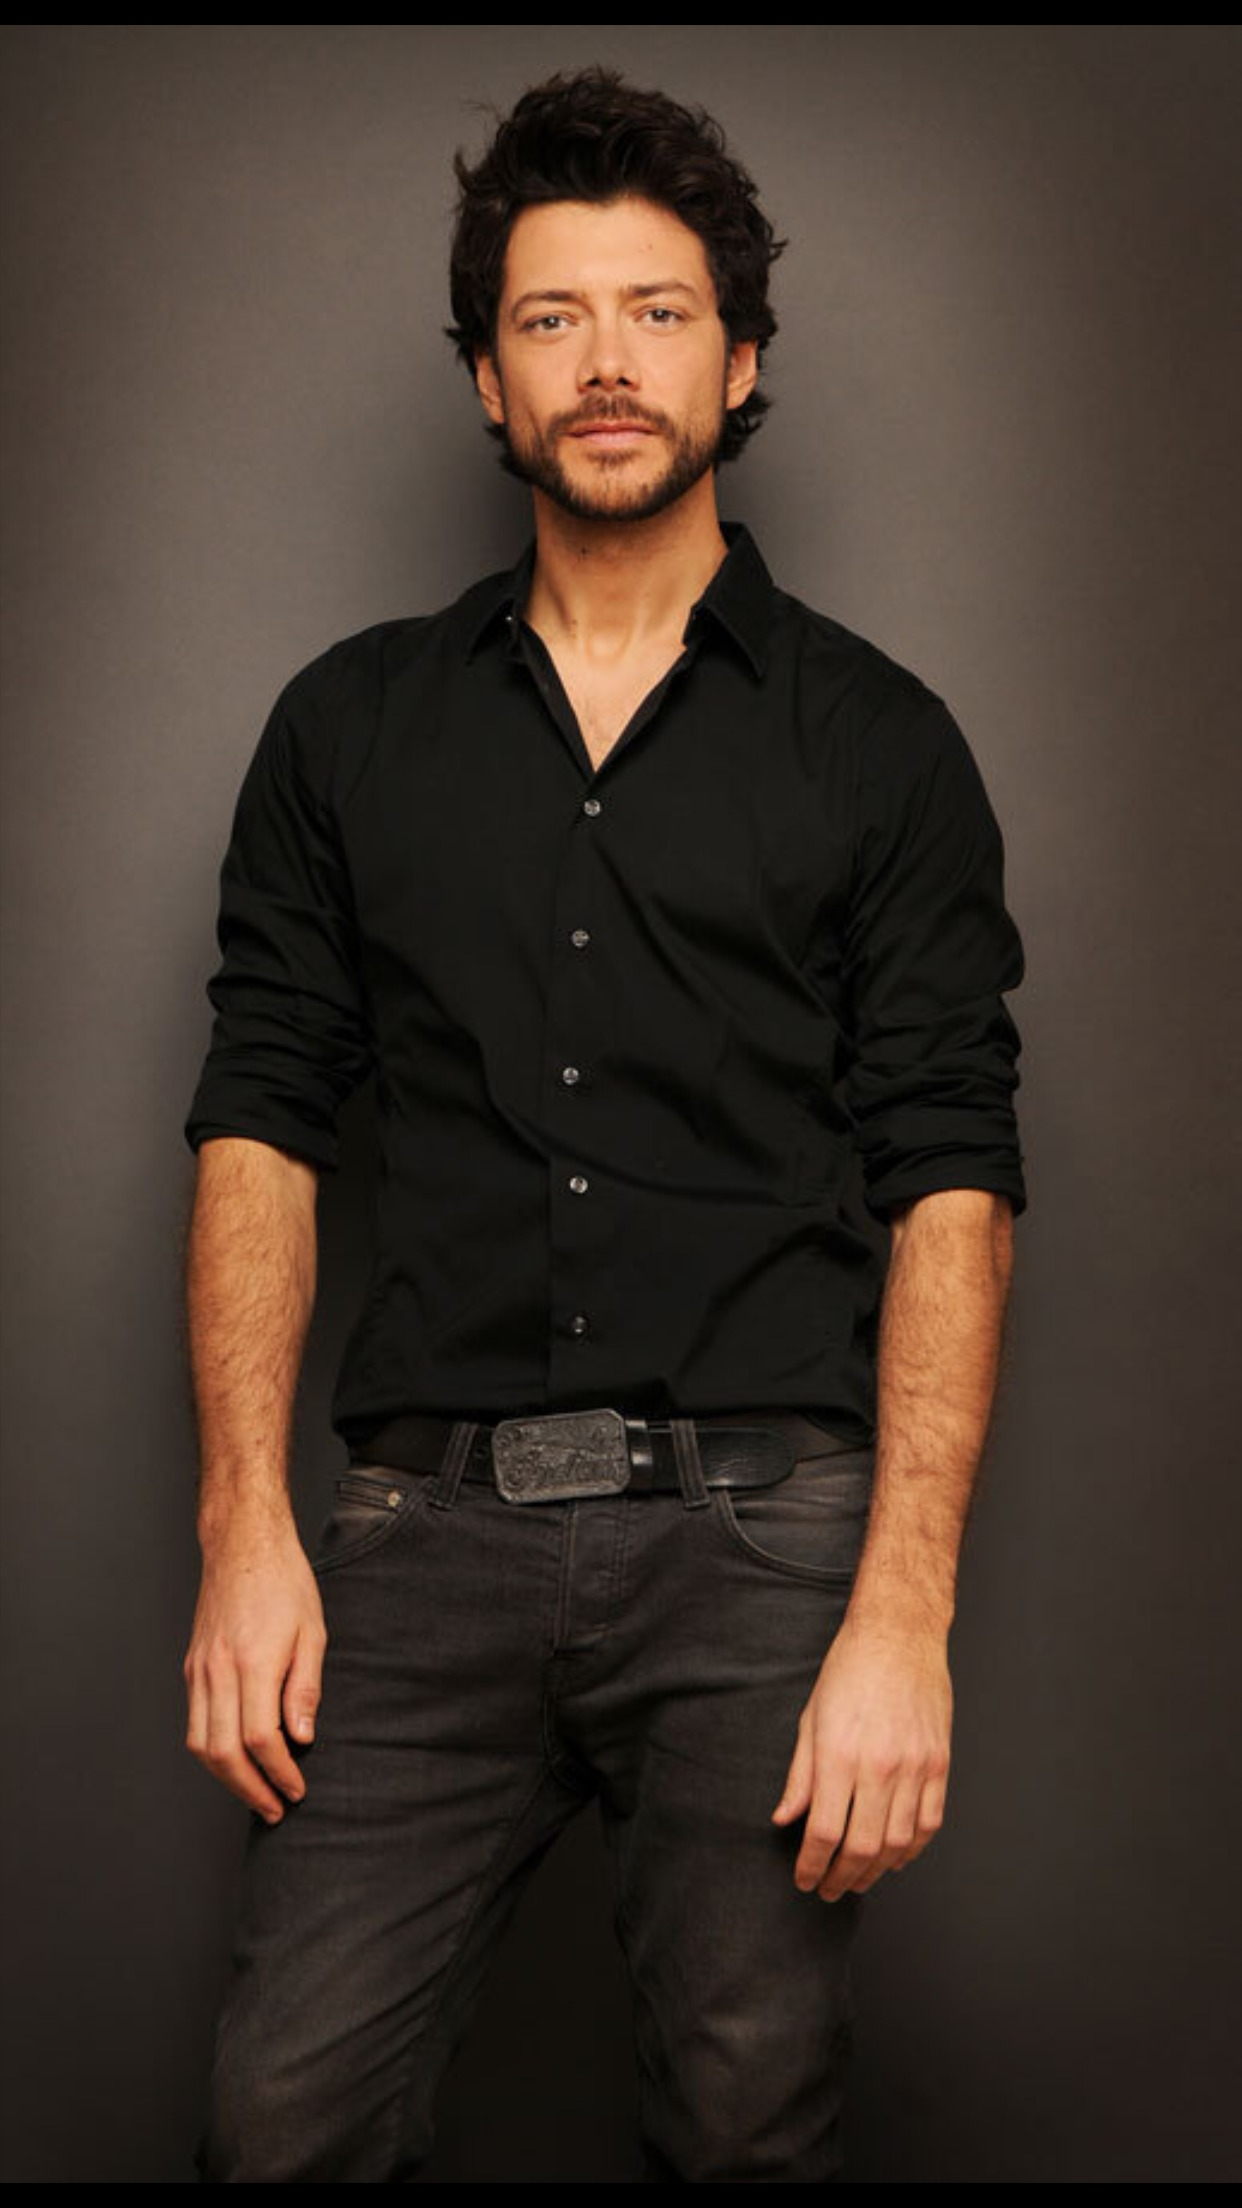 Spanish actor Alvaro Morte in black attire. Alvaro Morte is best known for his performance of El Professor in Spanish drama series Money Heist.